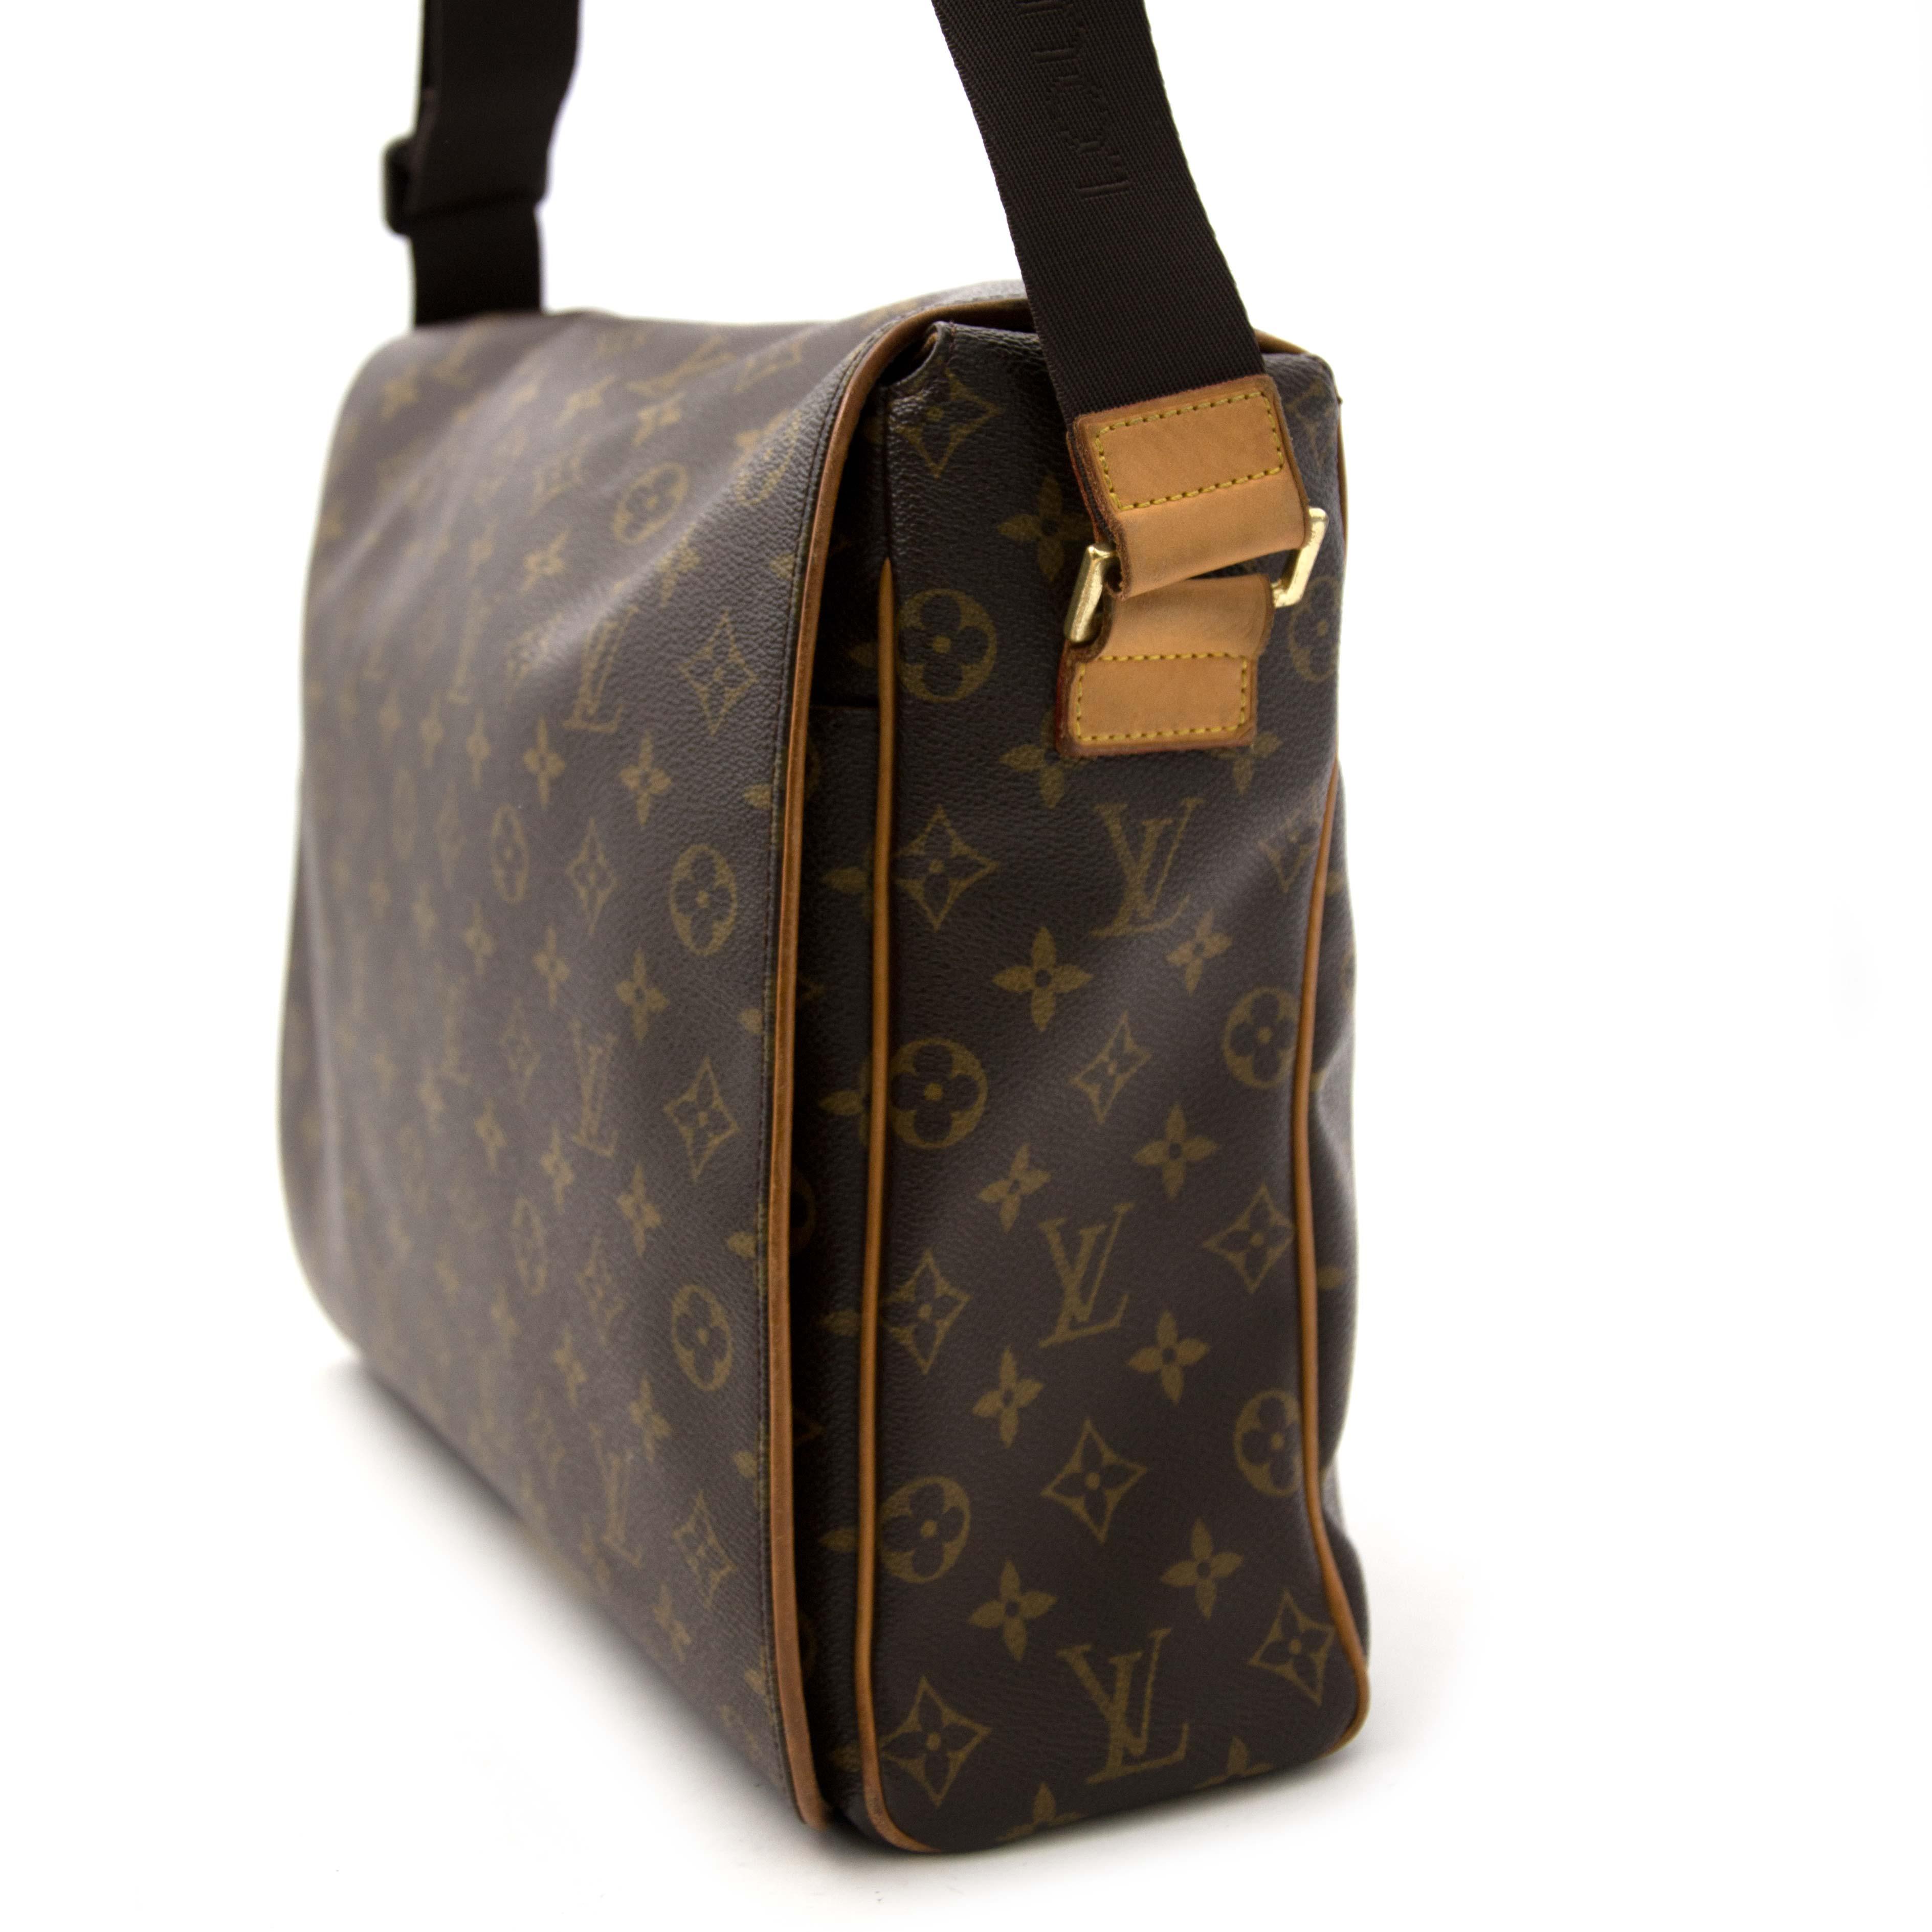 looking for a secondhand Louis Vuitton Monogram Bastille Valmy GM Messenger Bag